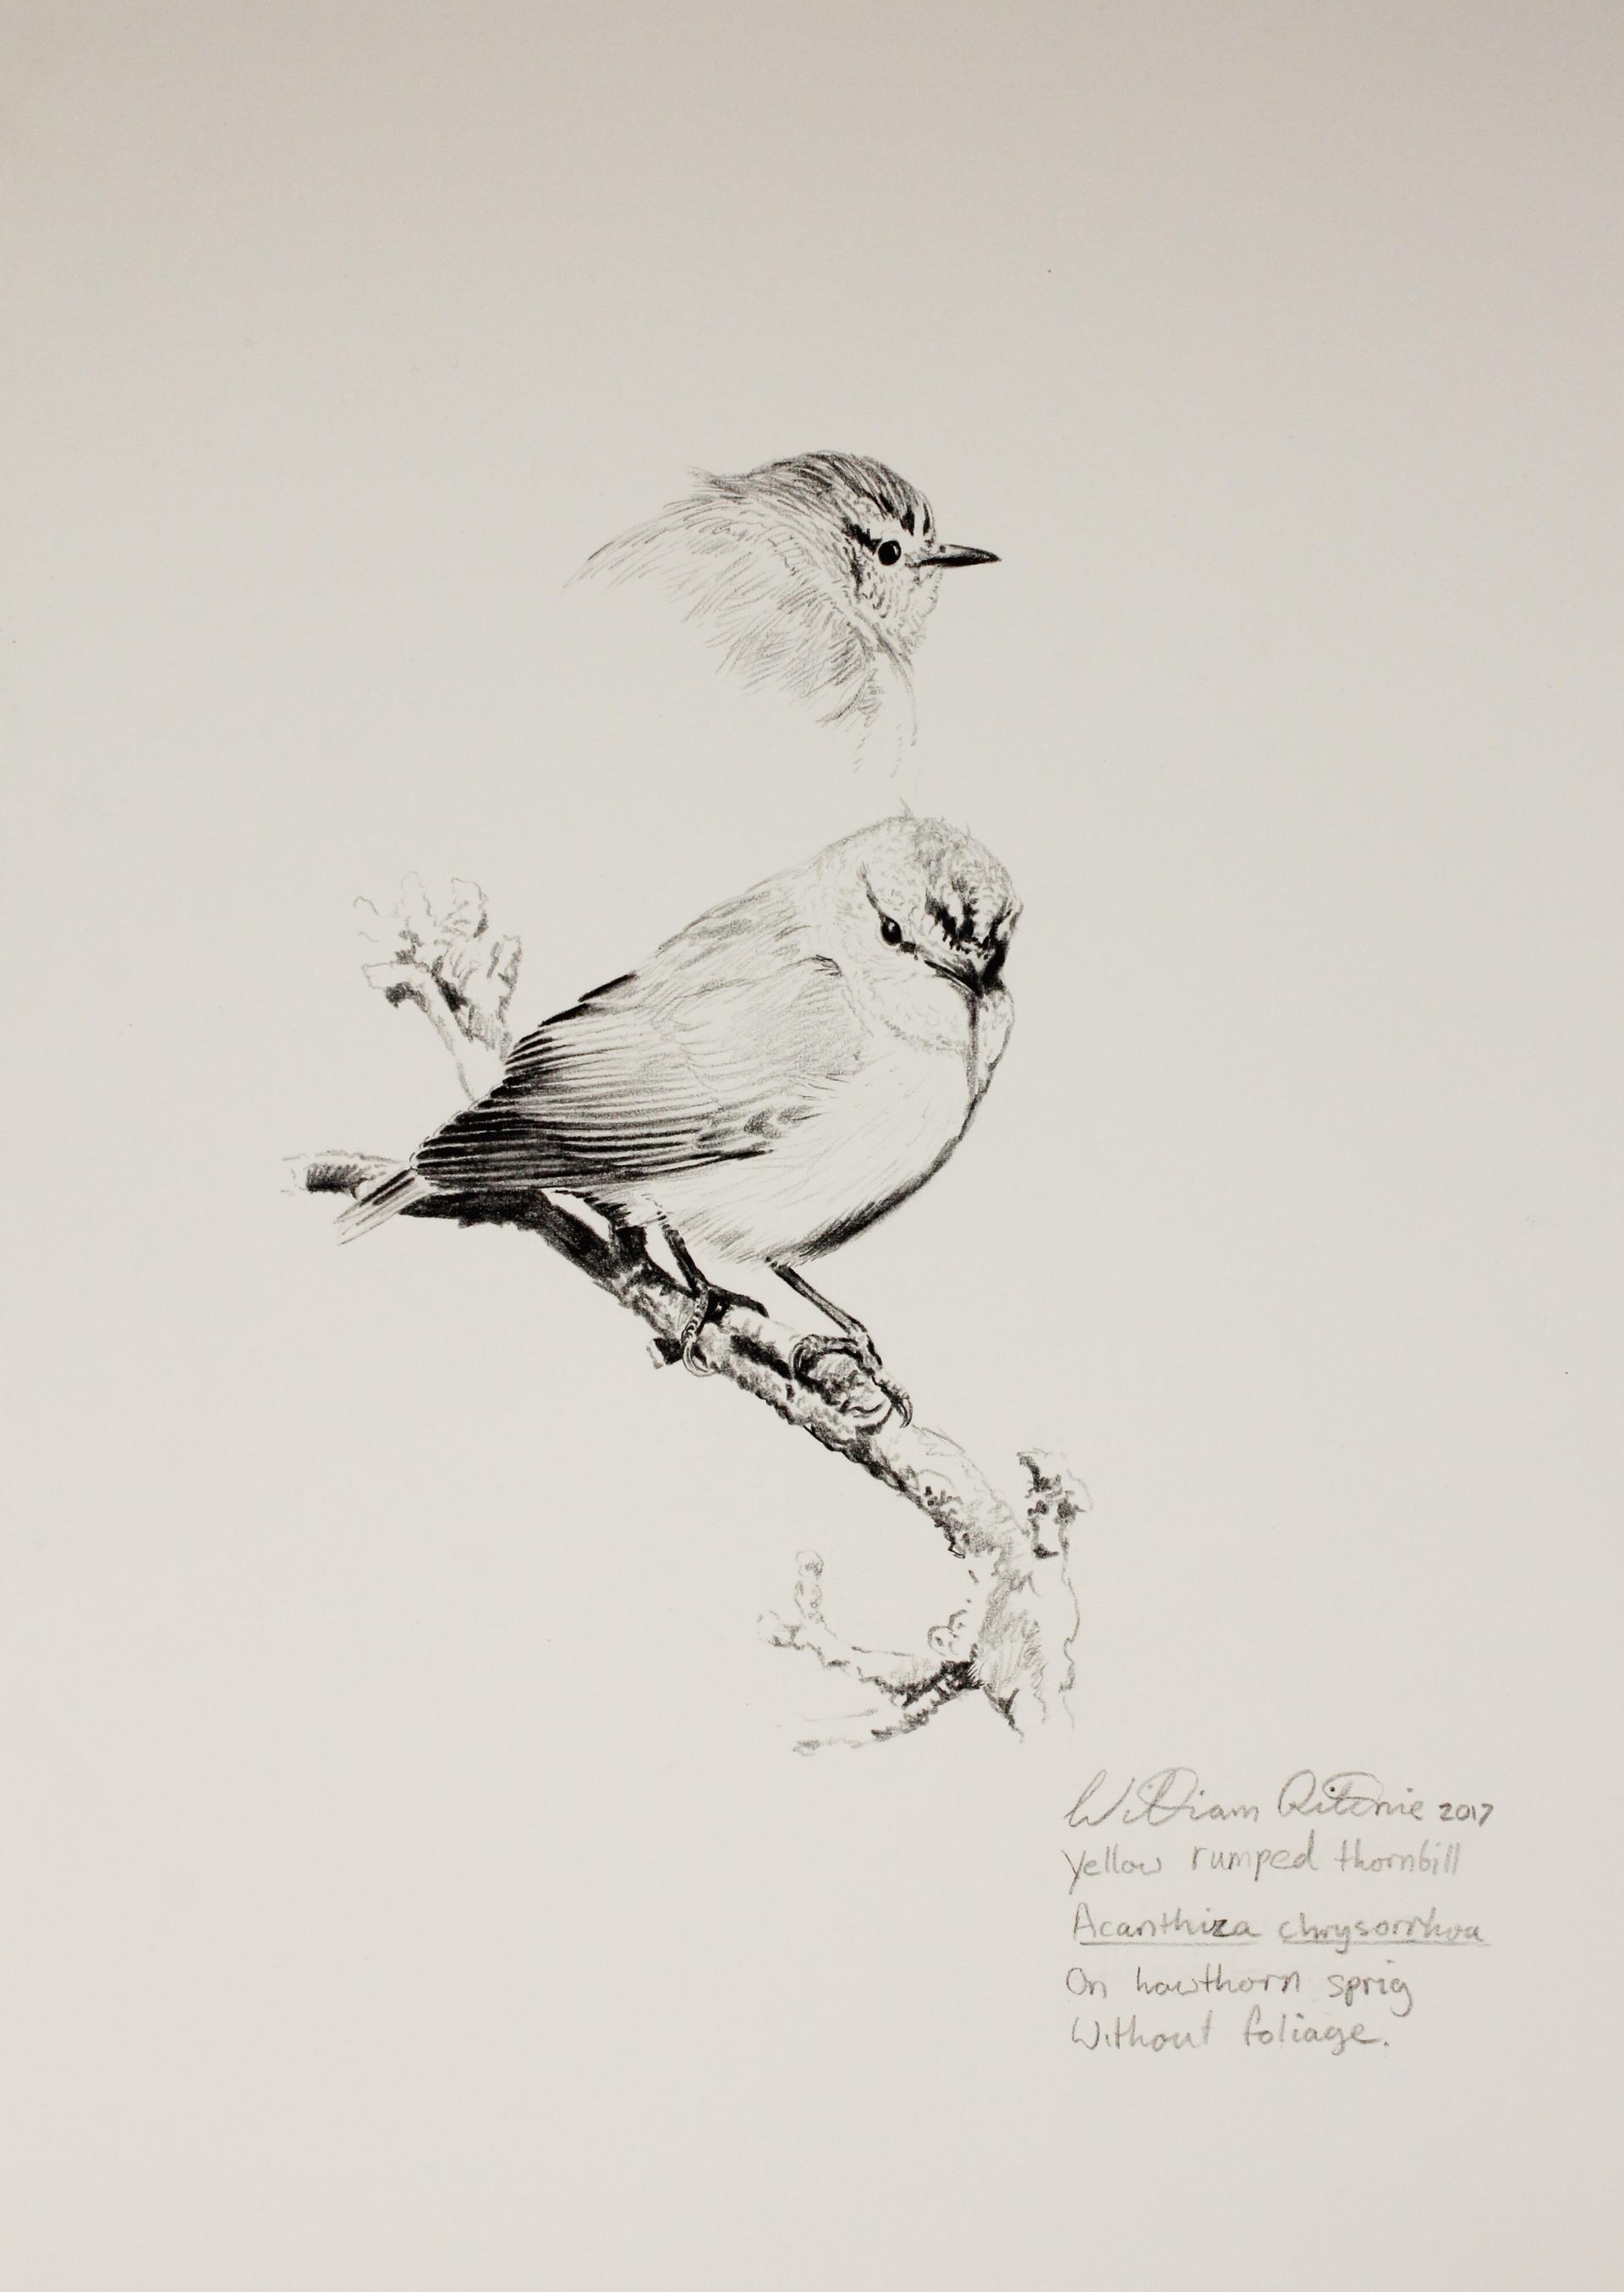 Yellow-rumped thornbill study